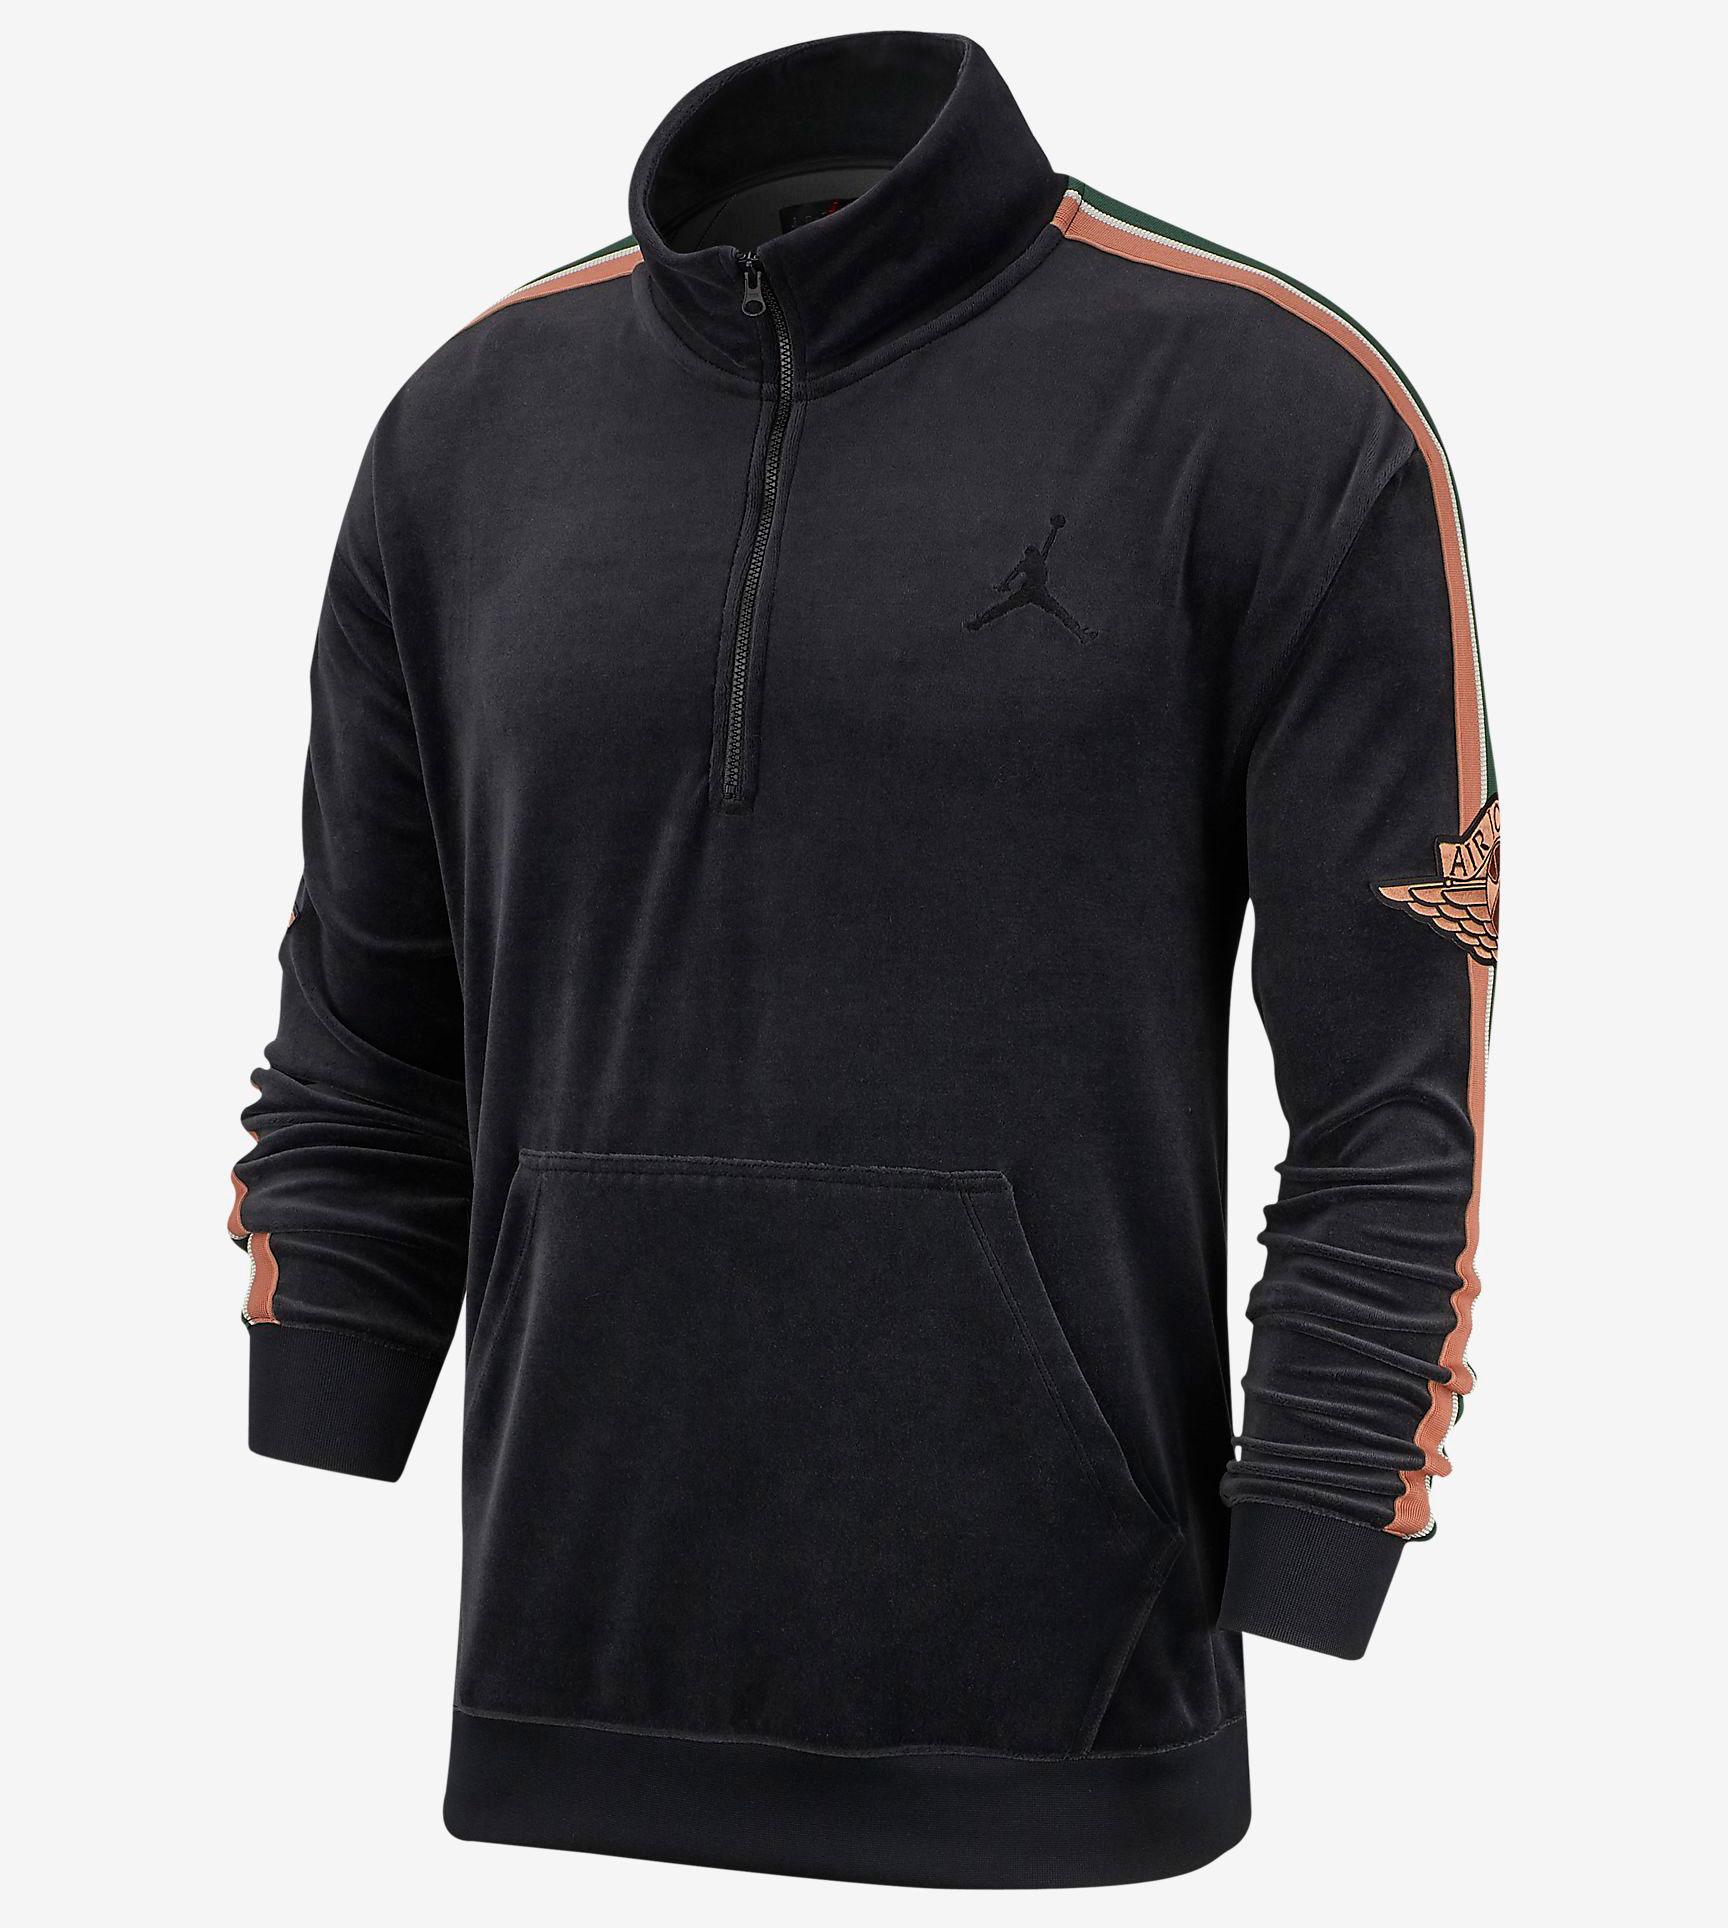 jordan-1-crimson-tint-matching-jacket-1